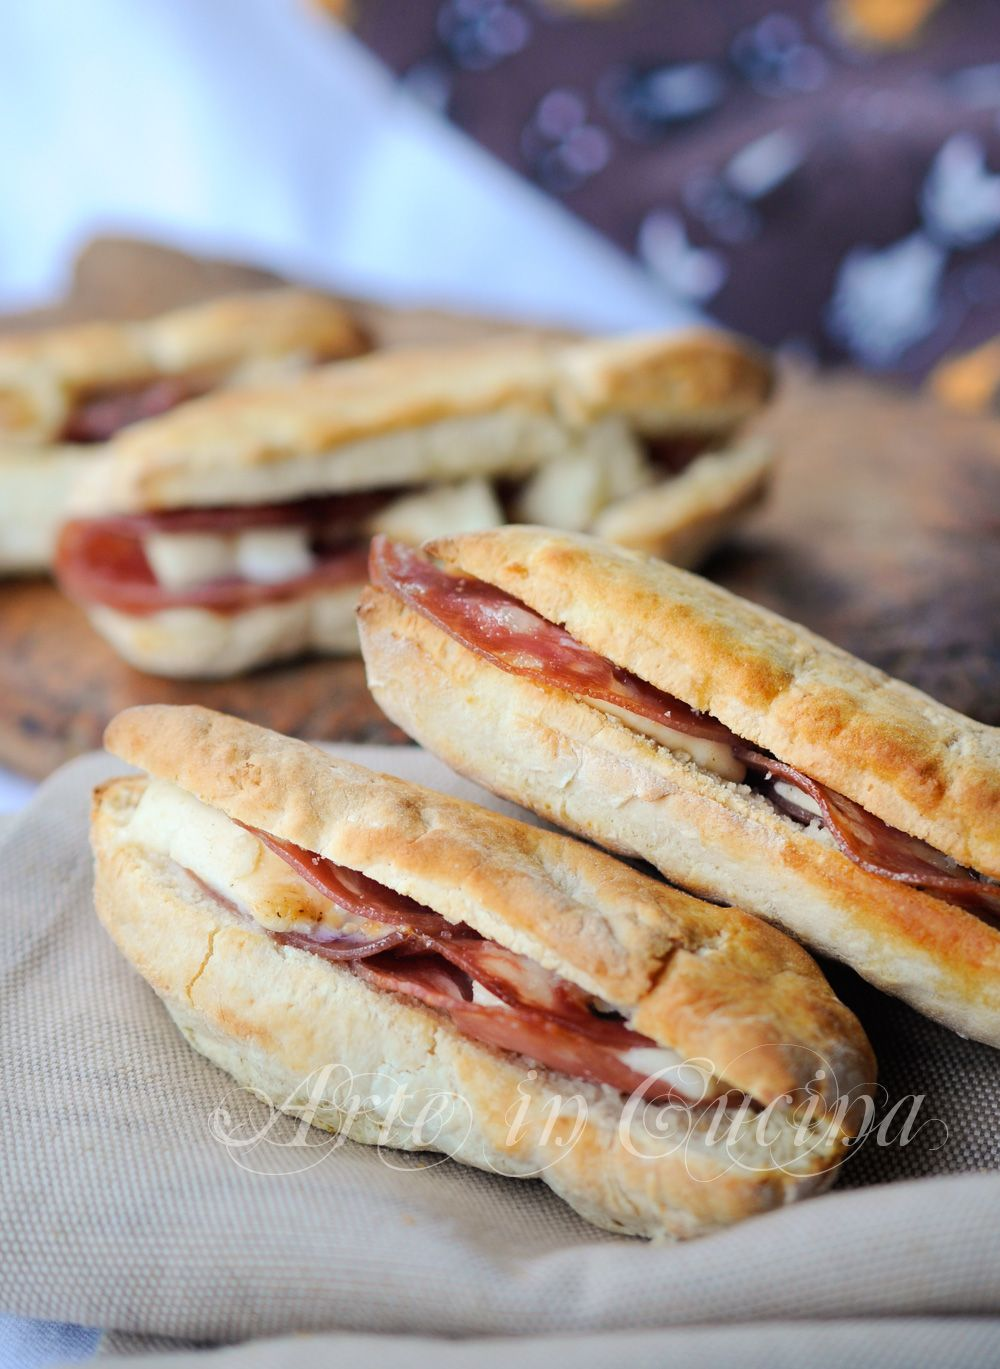 Bauletti salati farciti ricetta finger food veloce vickyart arte in cucina